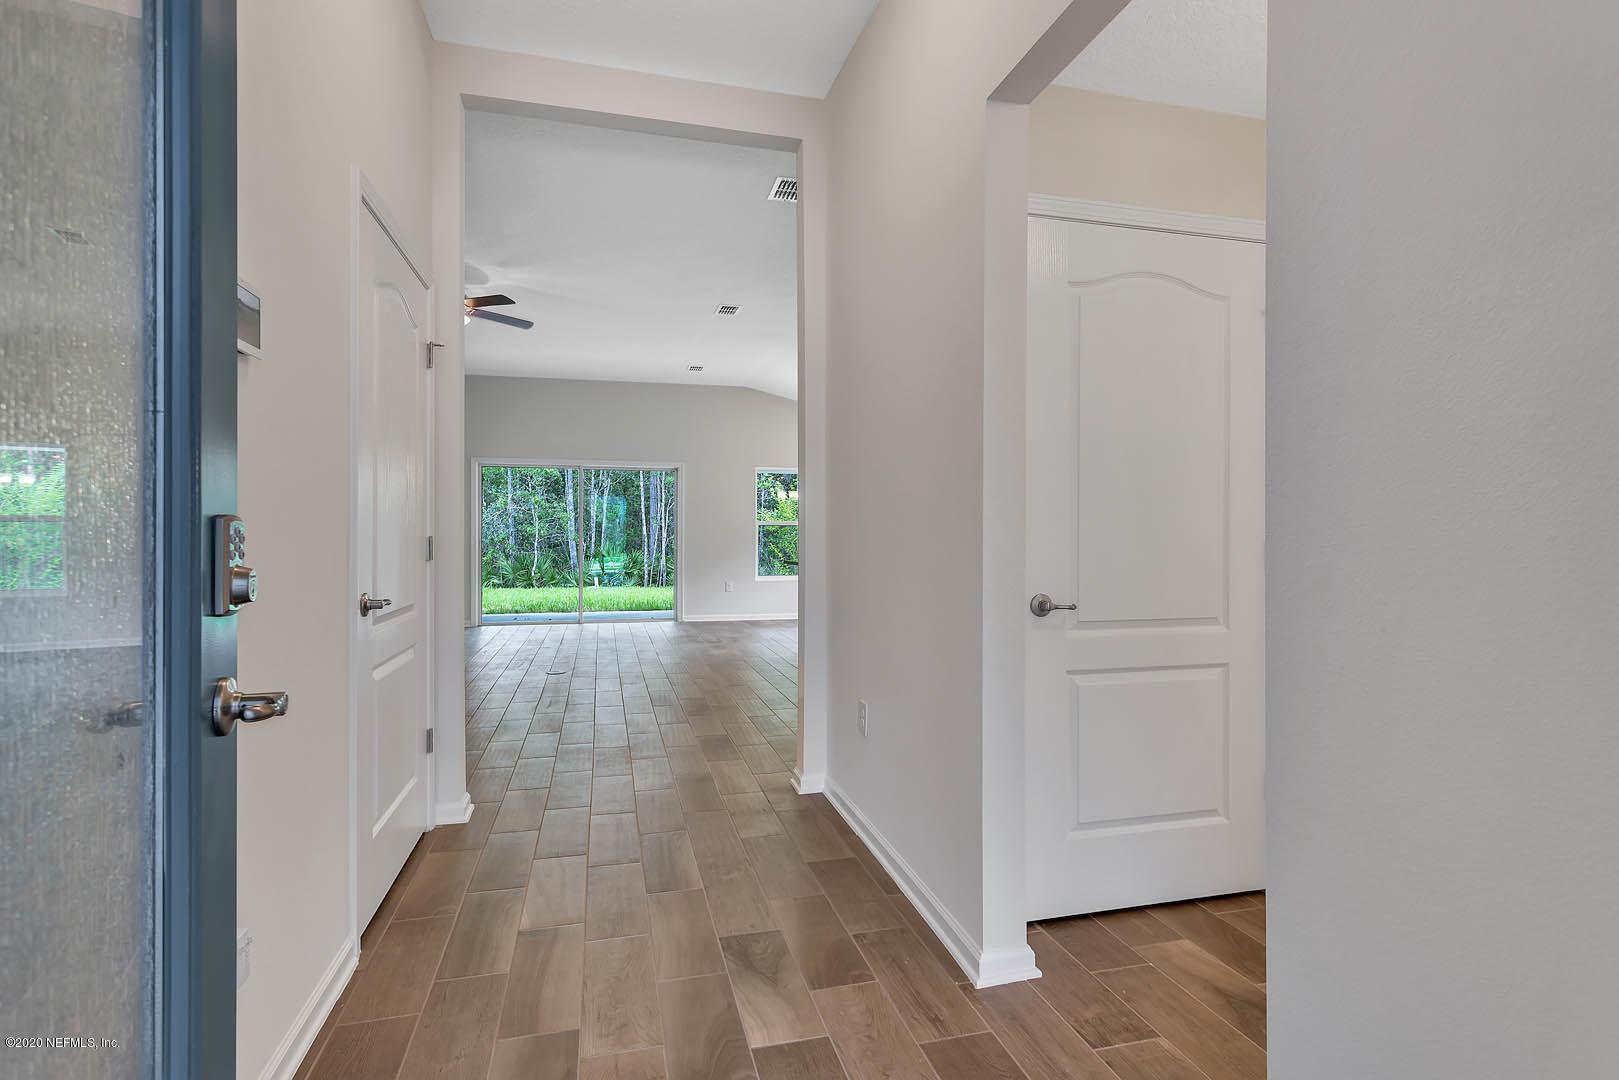 23 BIRDIE, BUNNELL, FLORIDA 32110, 3 Bedrooms Bedrooms, ,2 BathroomsBathrooms,Residential,For sale,BIRDIE,1052046